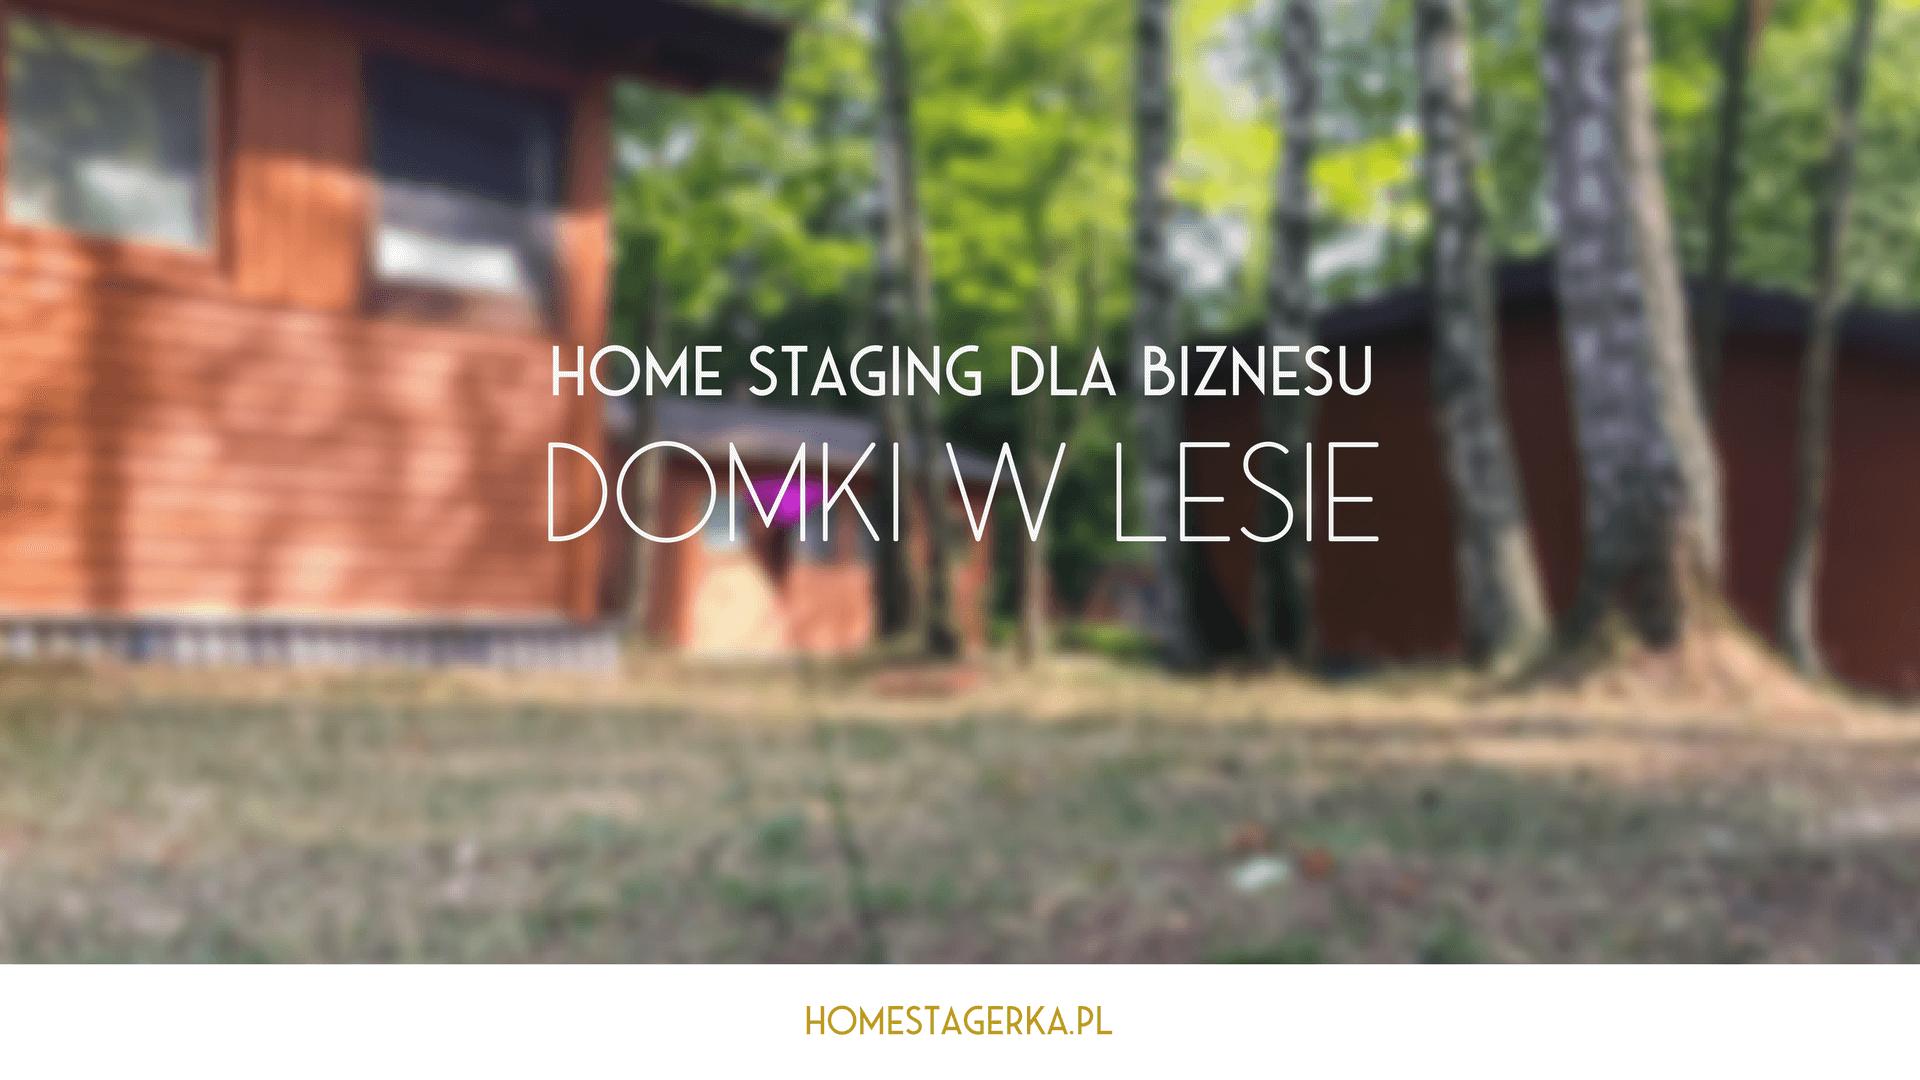 home staging dla biznesu - domki w lesie